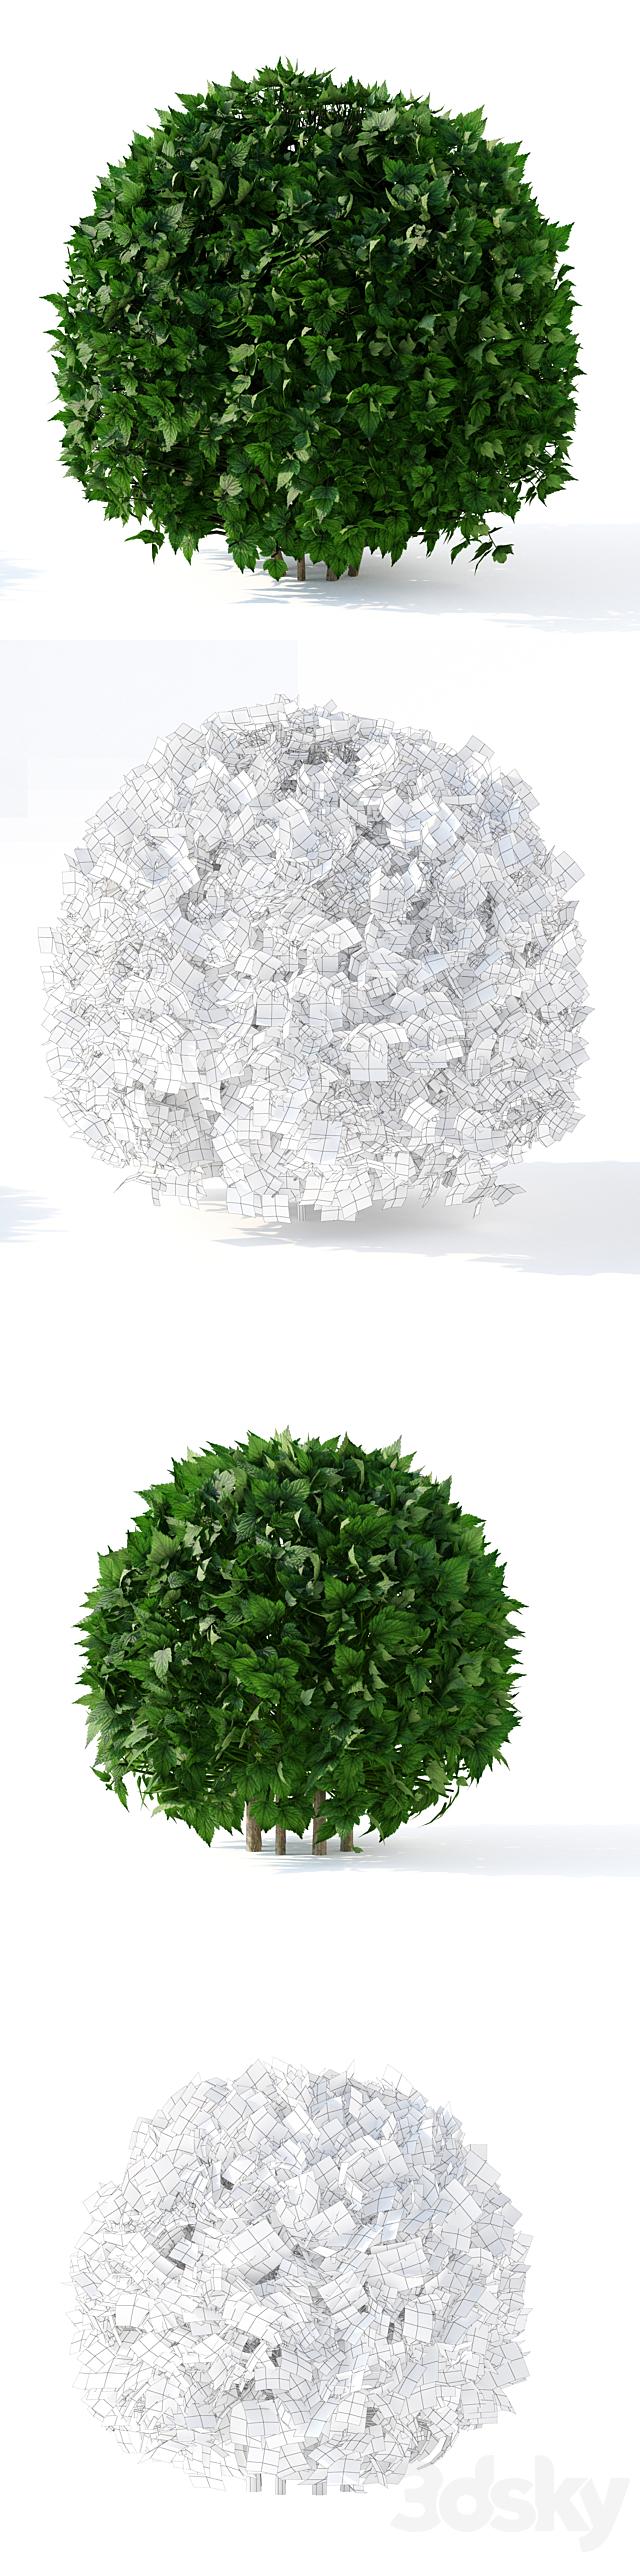 Green apple leaf bush 2 bush   Physocarpus opulifolius sphere